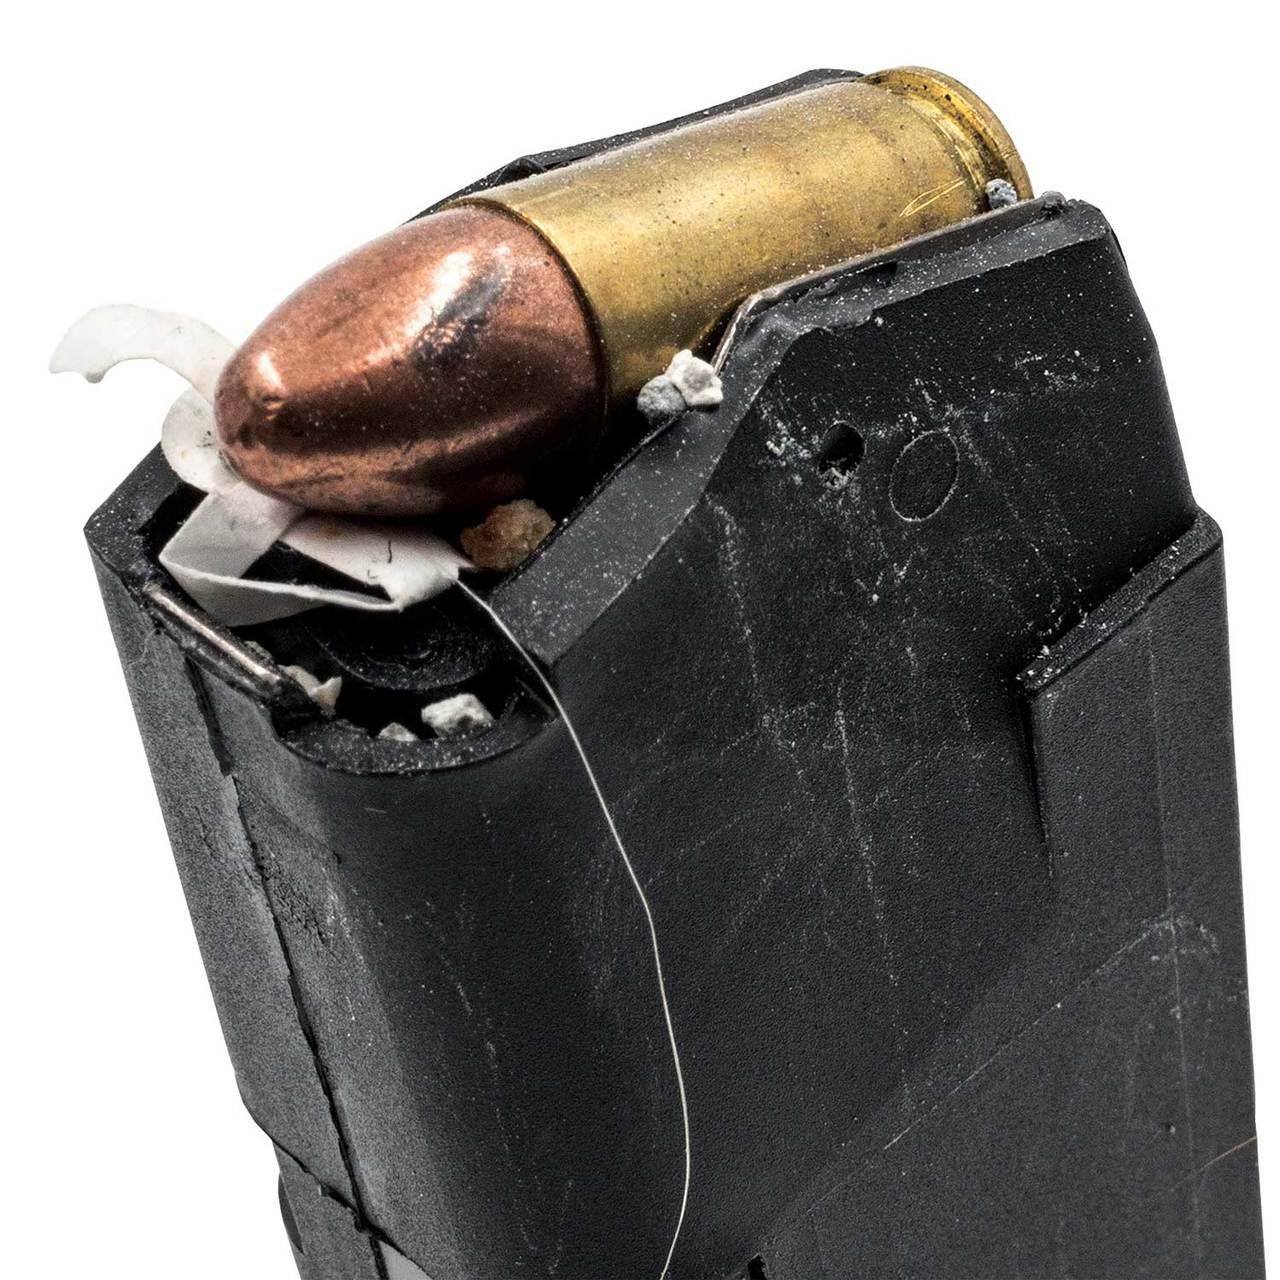 Glock 17 Ammo Armor